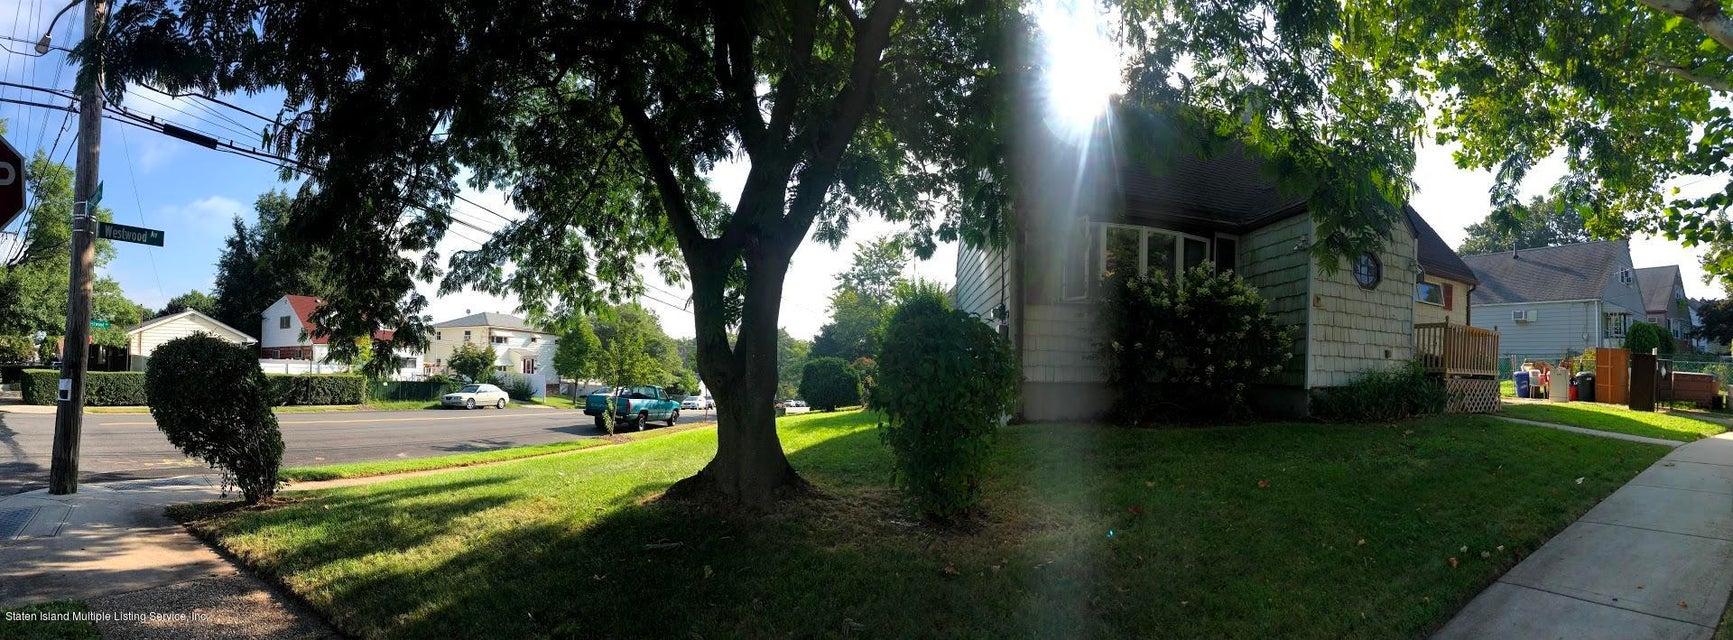 Single Family - Detached 207 Fanning Street  Staten Island, NY 10314, MLS-1122522-25